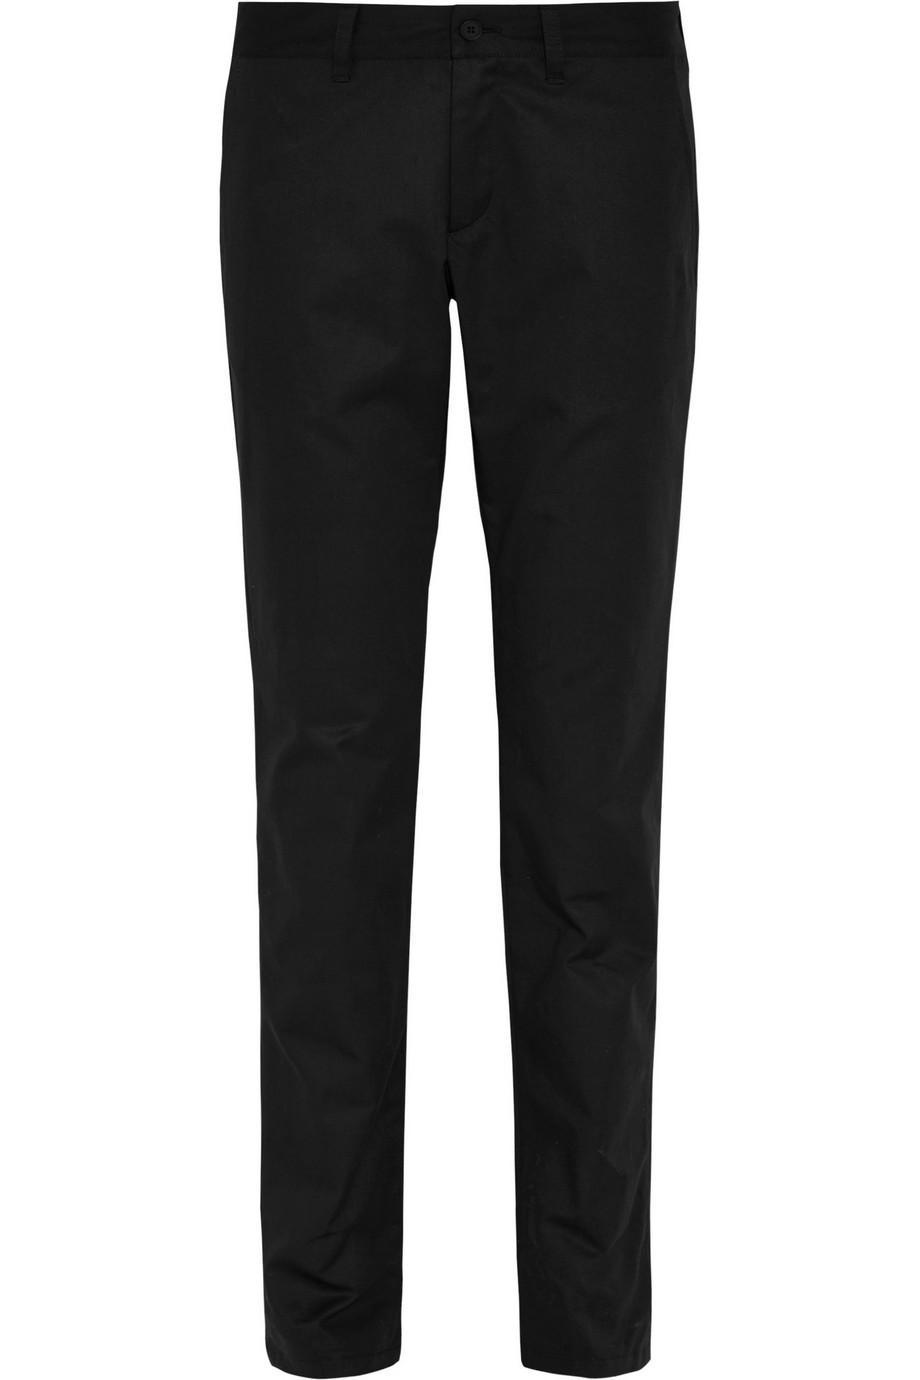 Tomas Maier Cotton-gabardine Tapered Pants